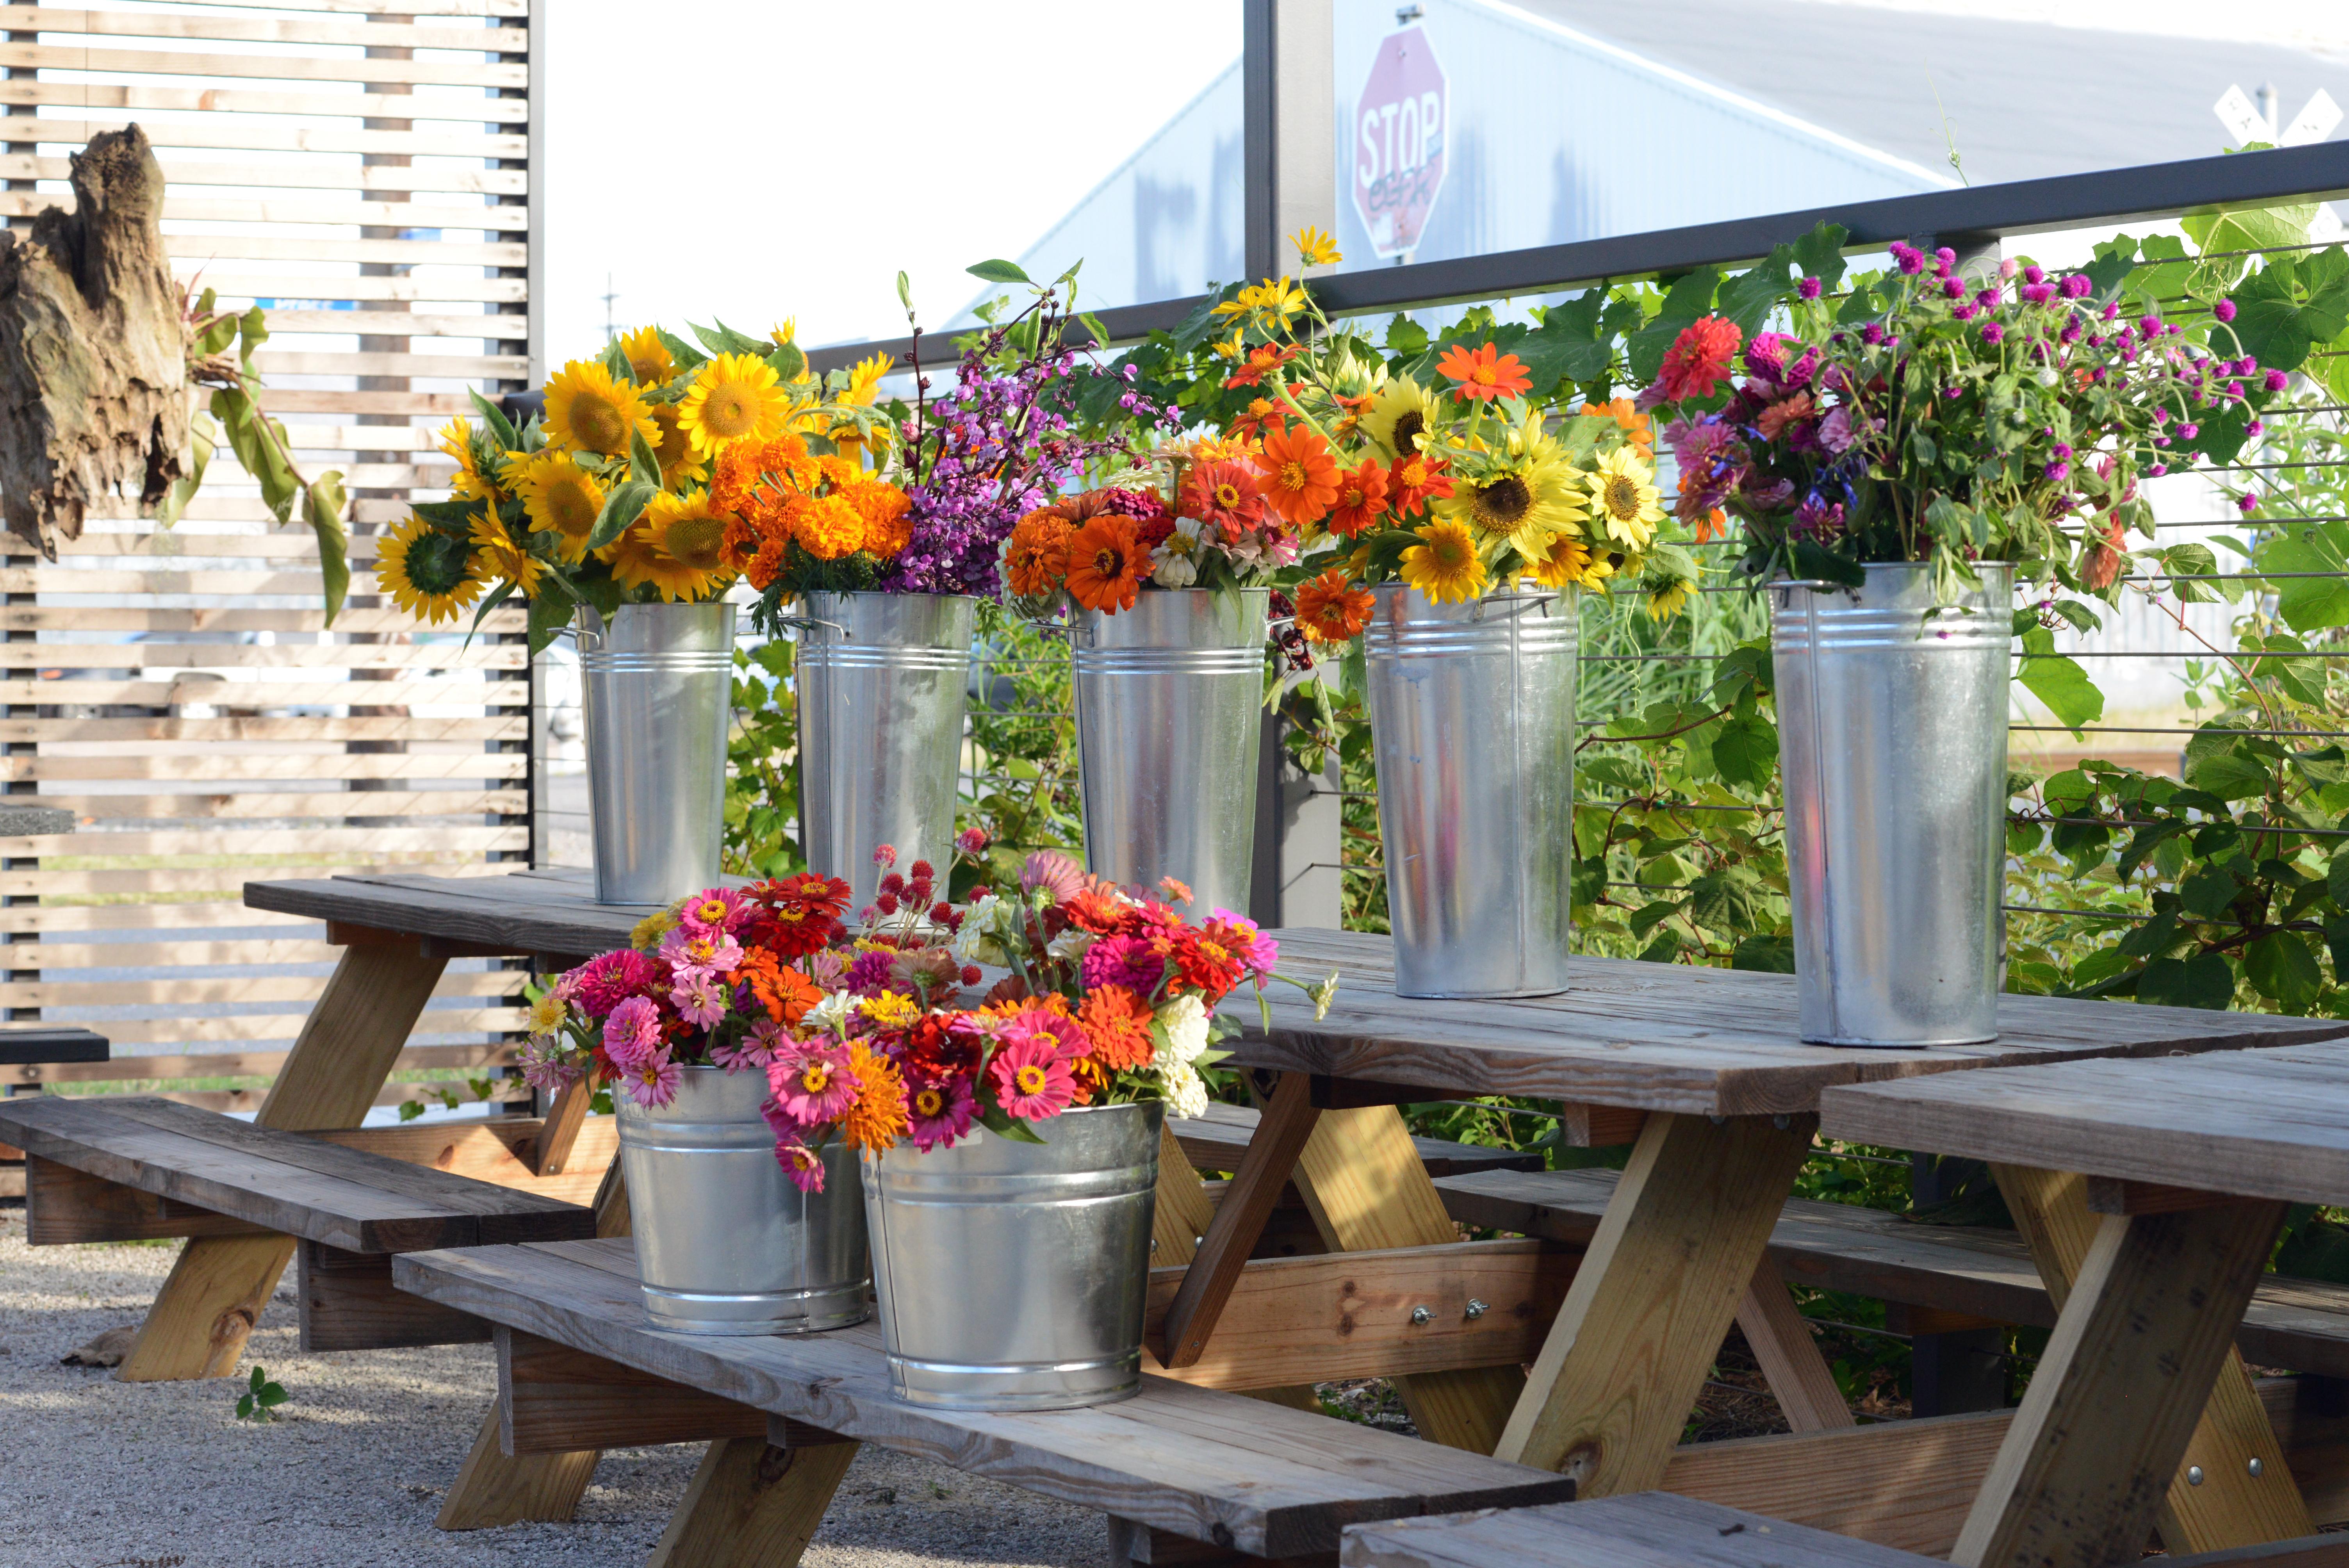 Fresh veggies and flowers from Press Street Gardens